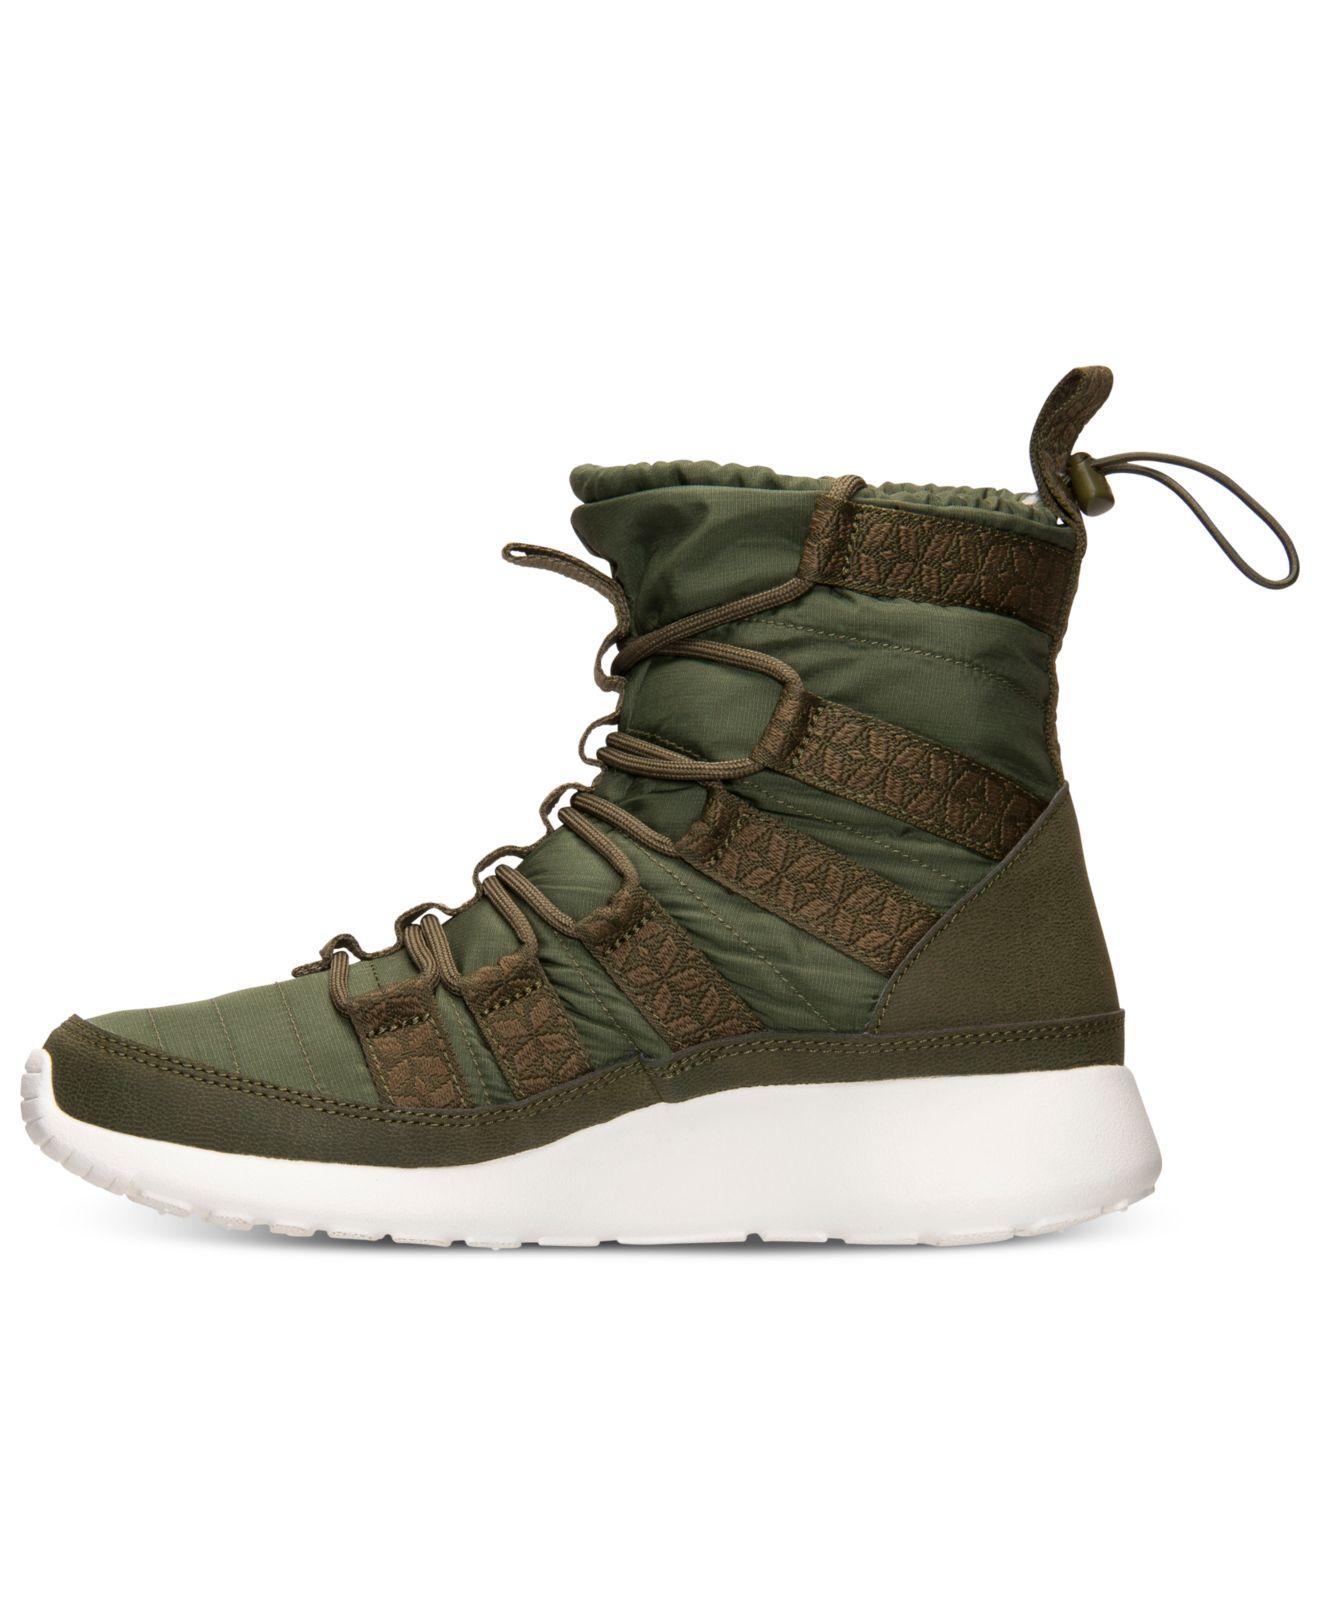 purchase cheap b76c2 4c57c ... Lyst - Nike WomenS Roshe Run Hi Sneakerboots From Finish Lin ...